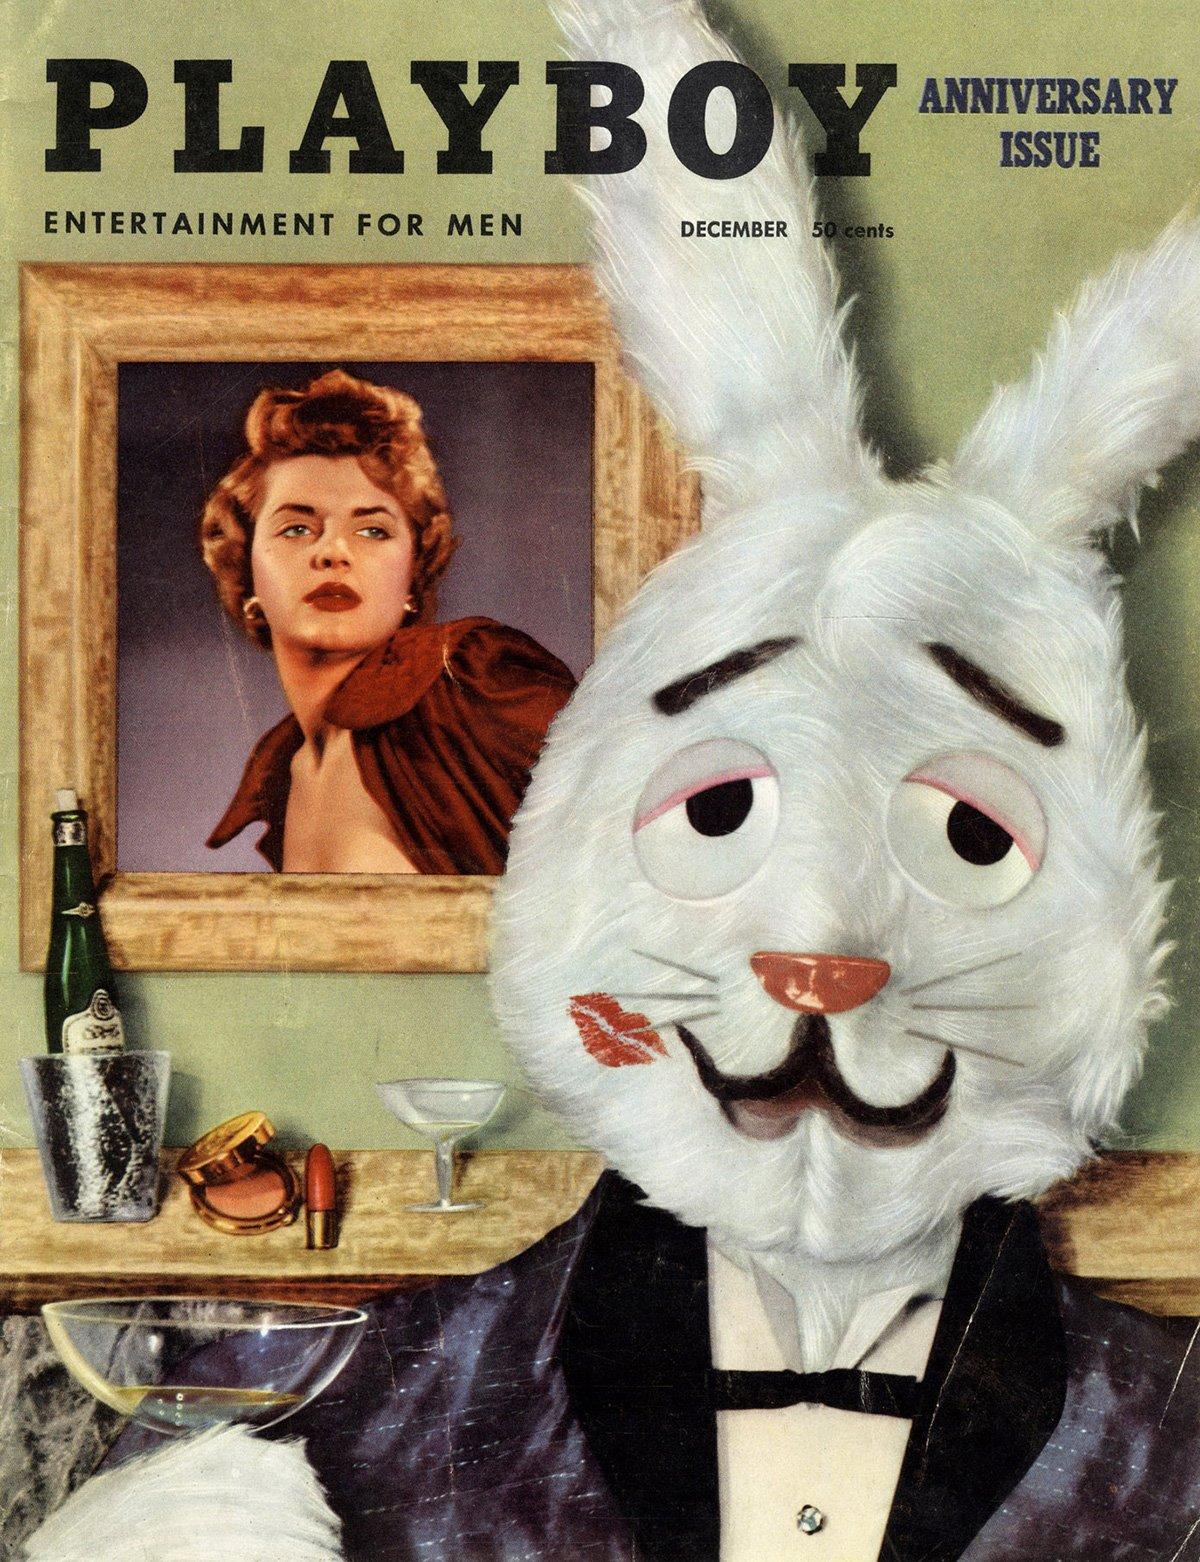 Playboy (USA) Vintage Magazine Back Issue Dated December 1954